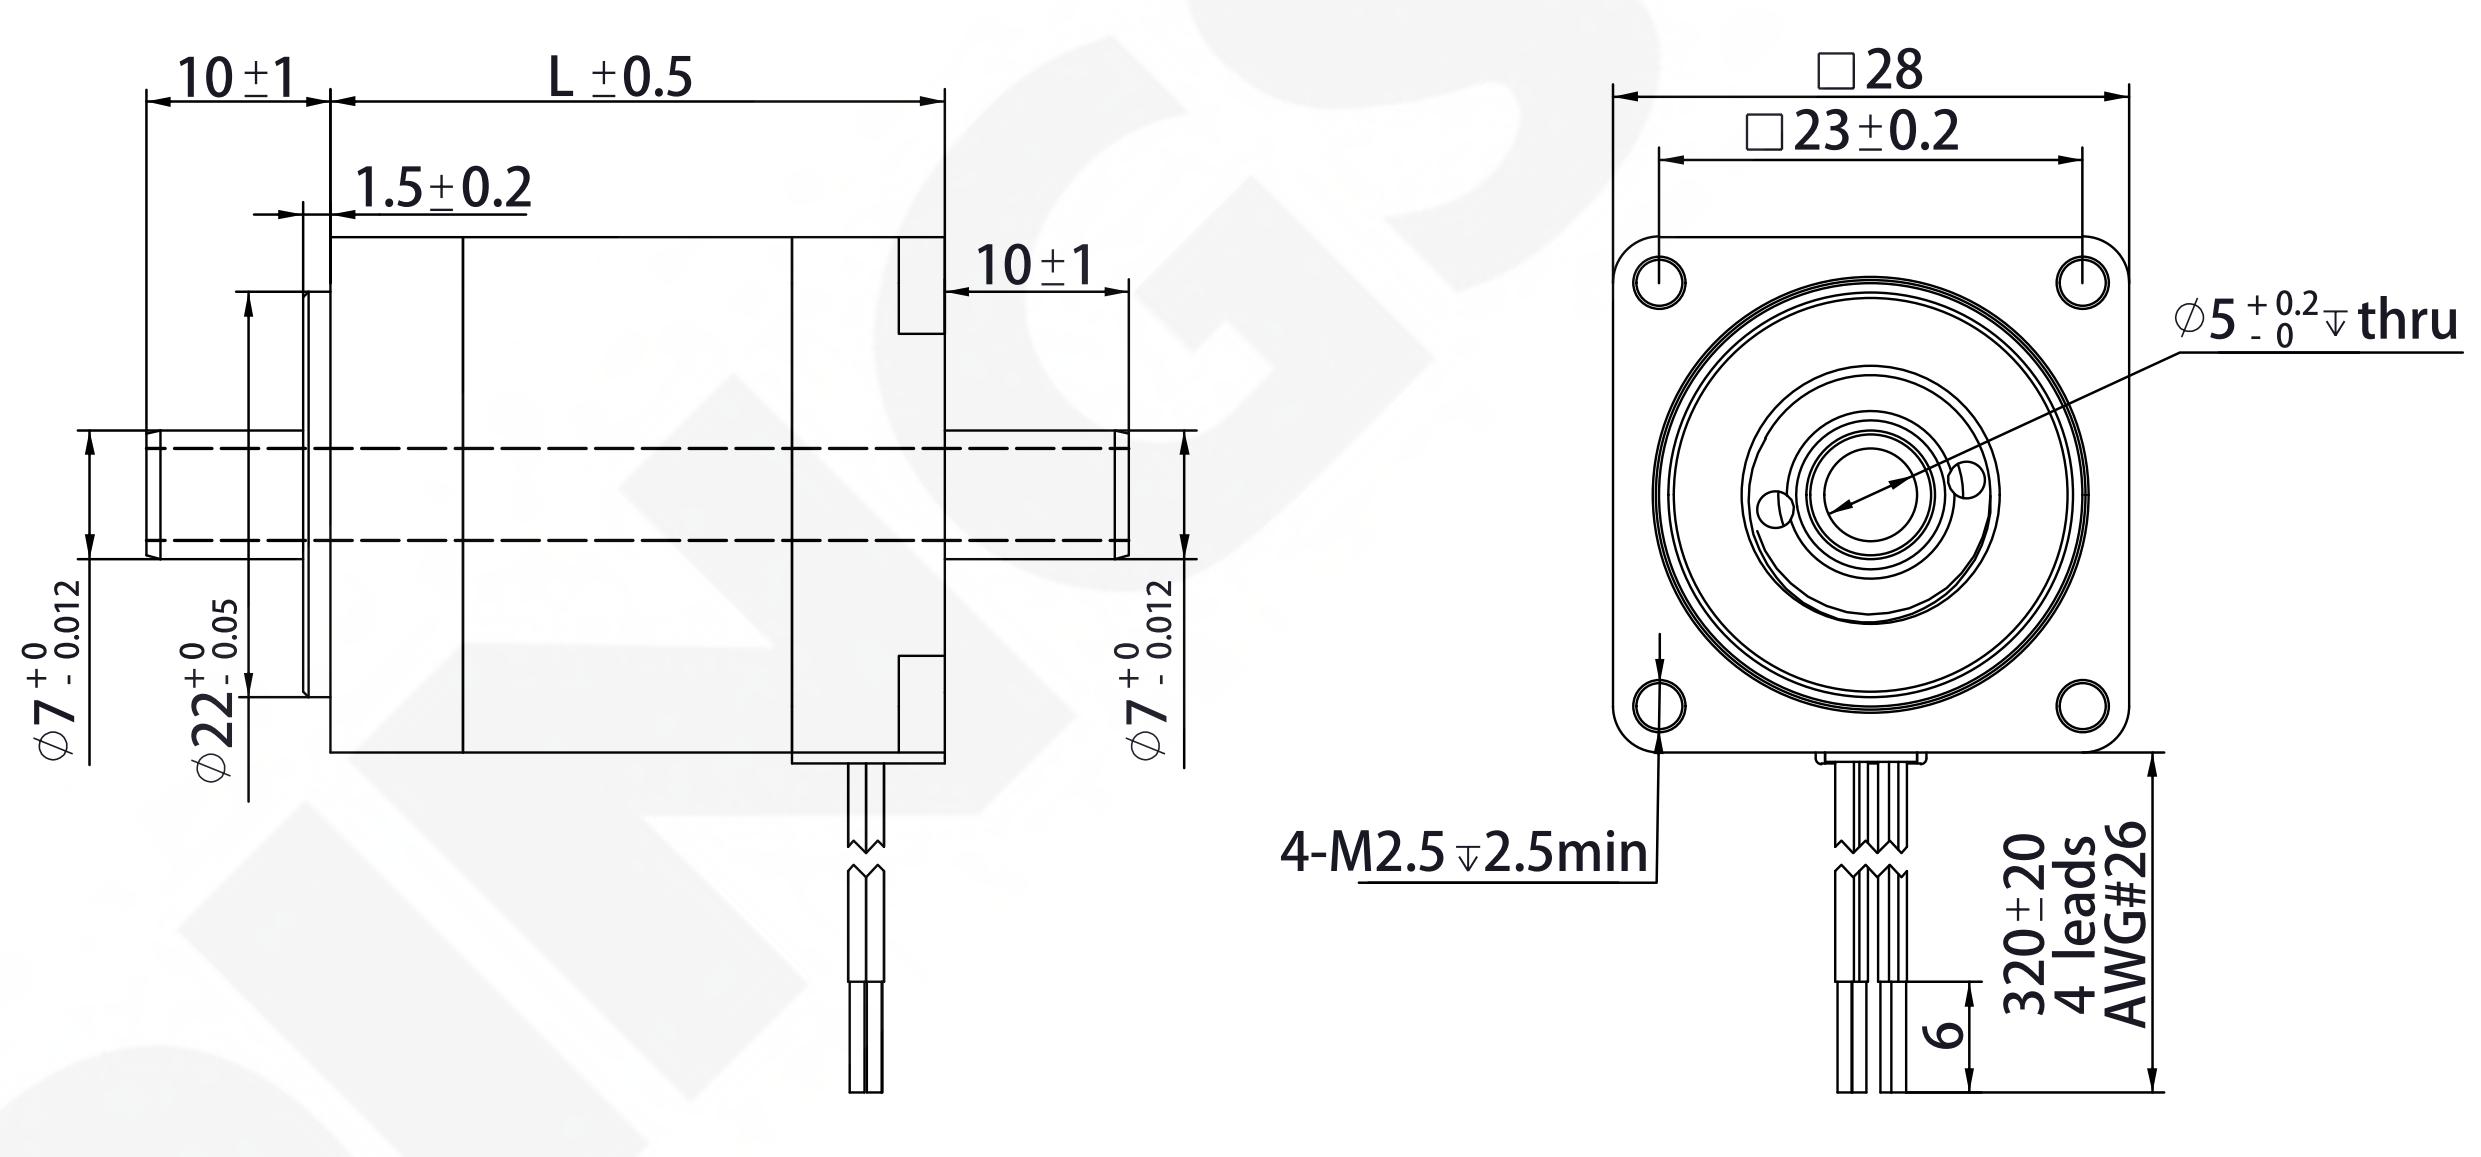 NEMA 11 Hollow Shaft Motor Drawing